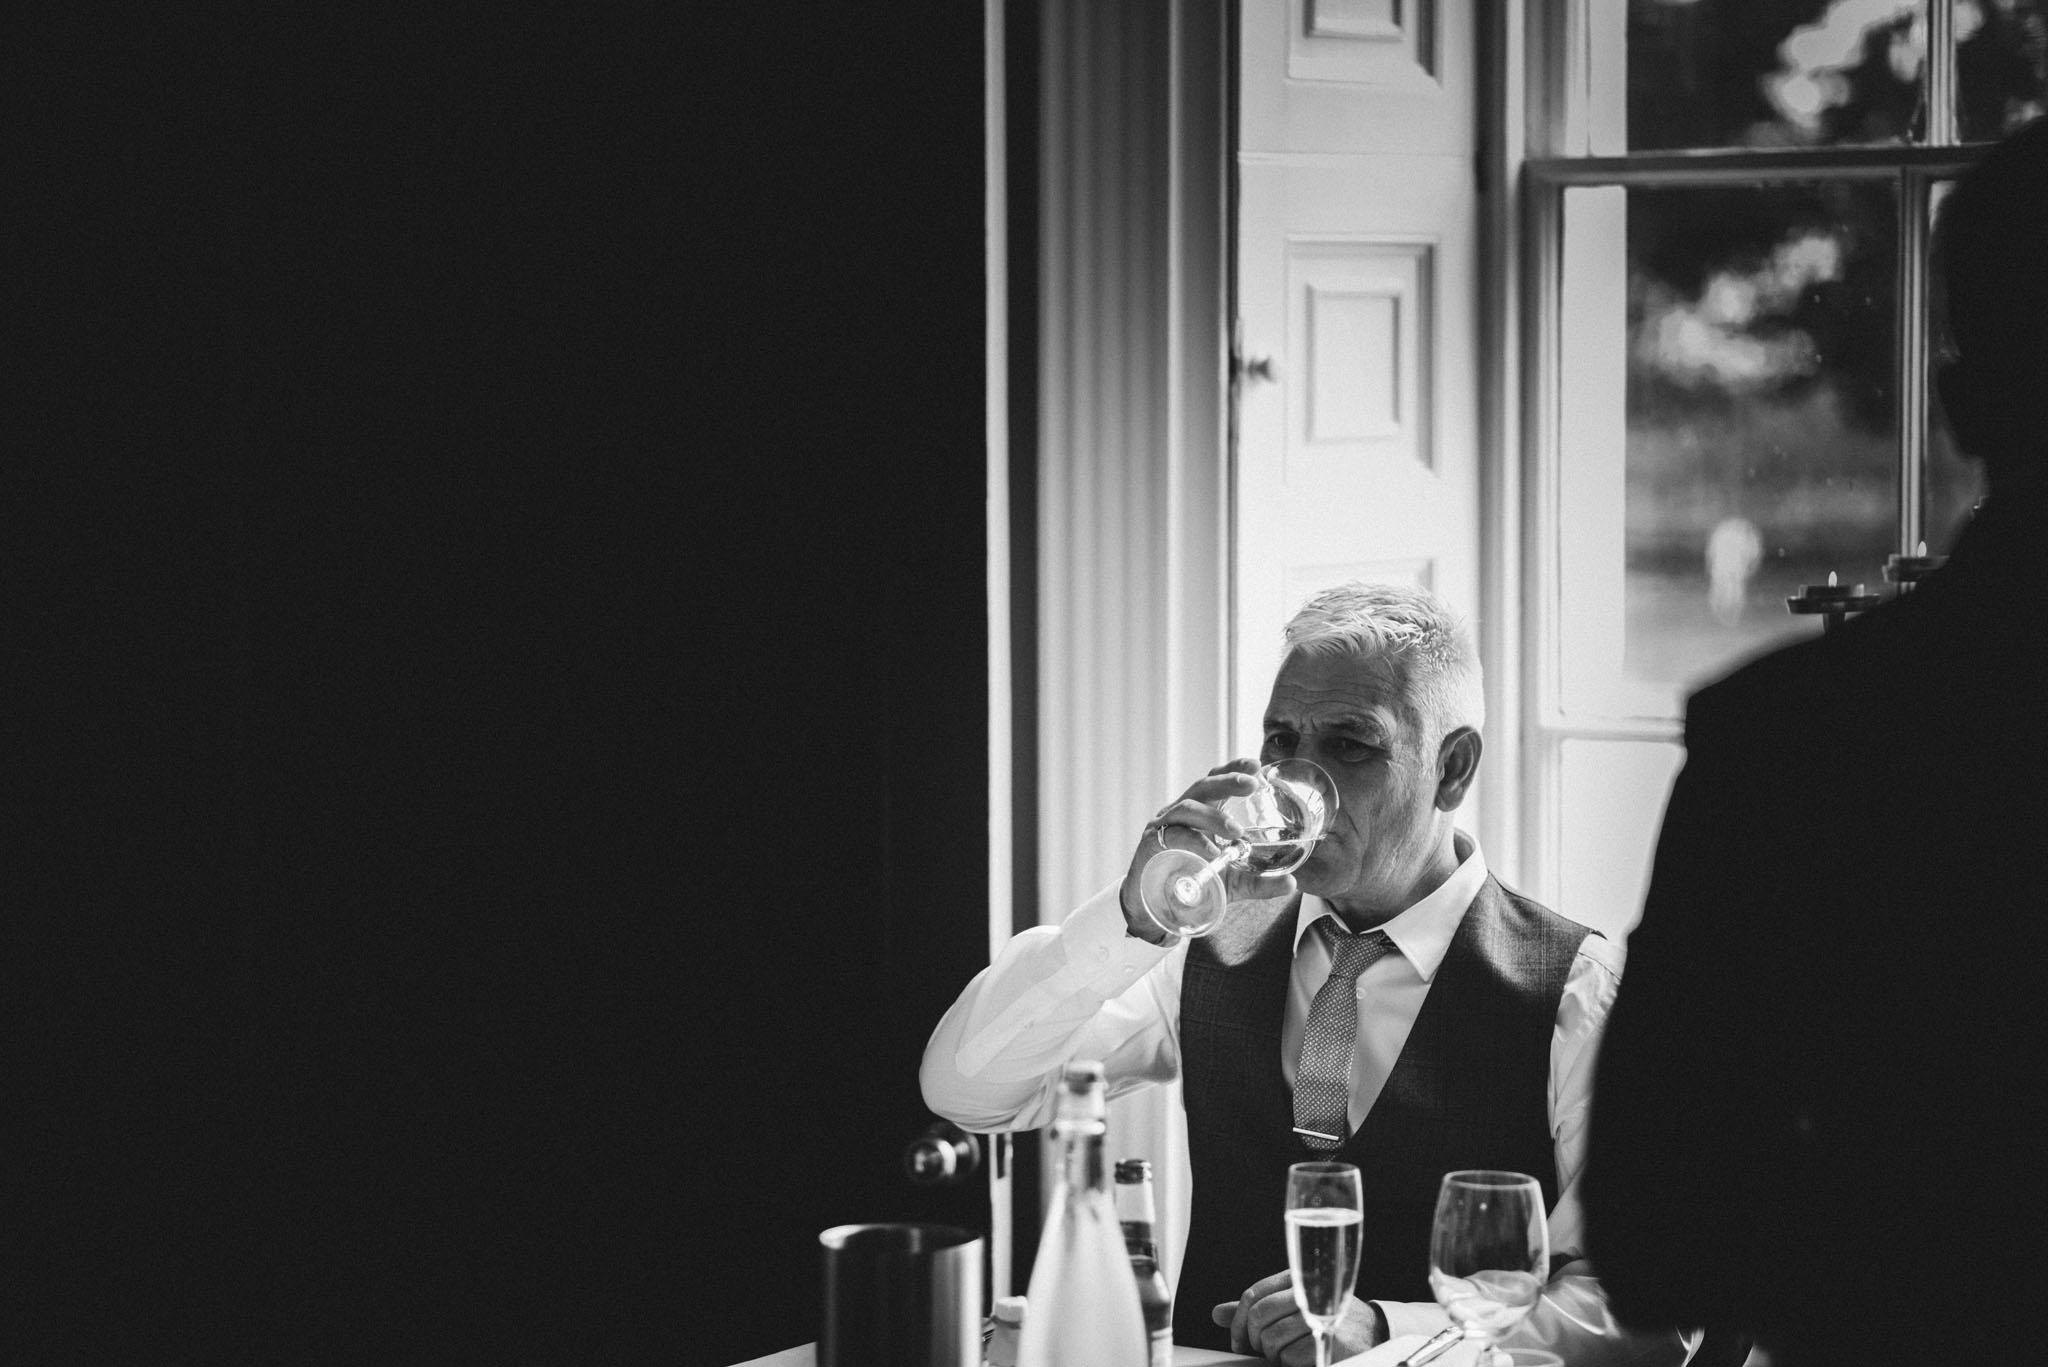 wedding-photographer-glewstone-court-hereford-scott-stockwell-photography381.jpg